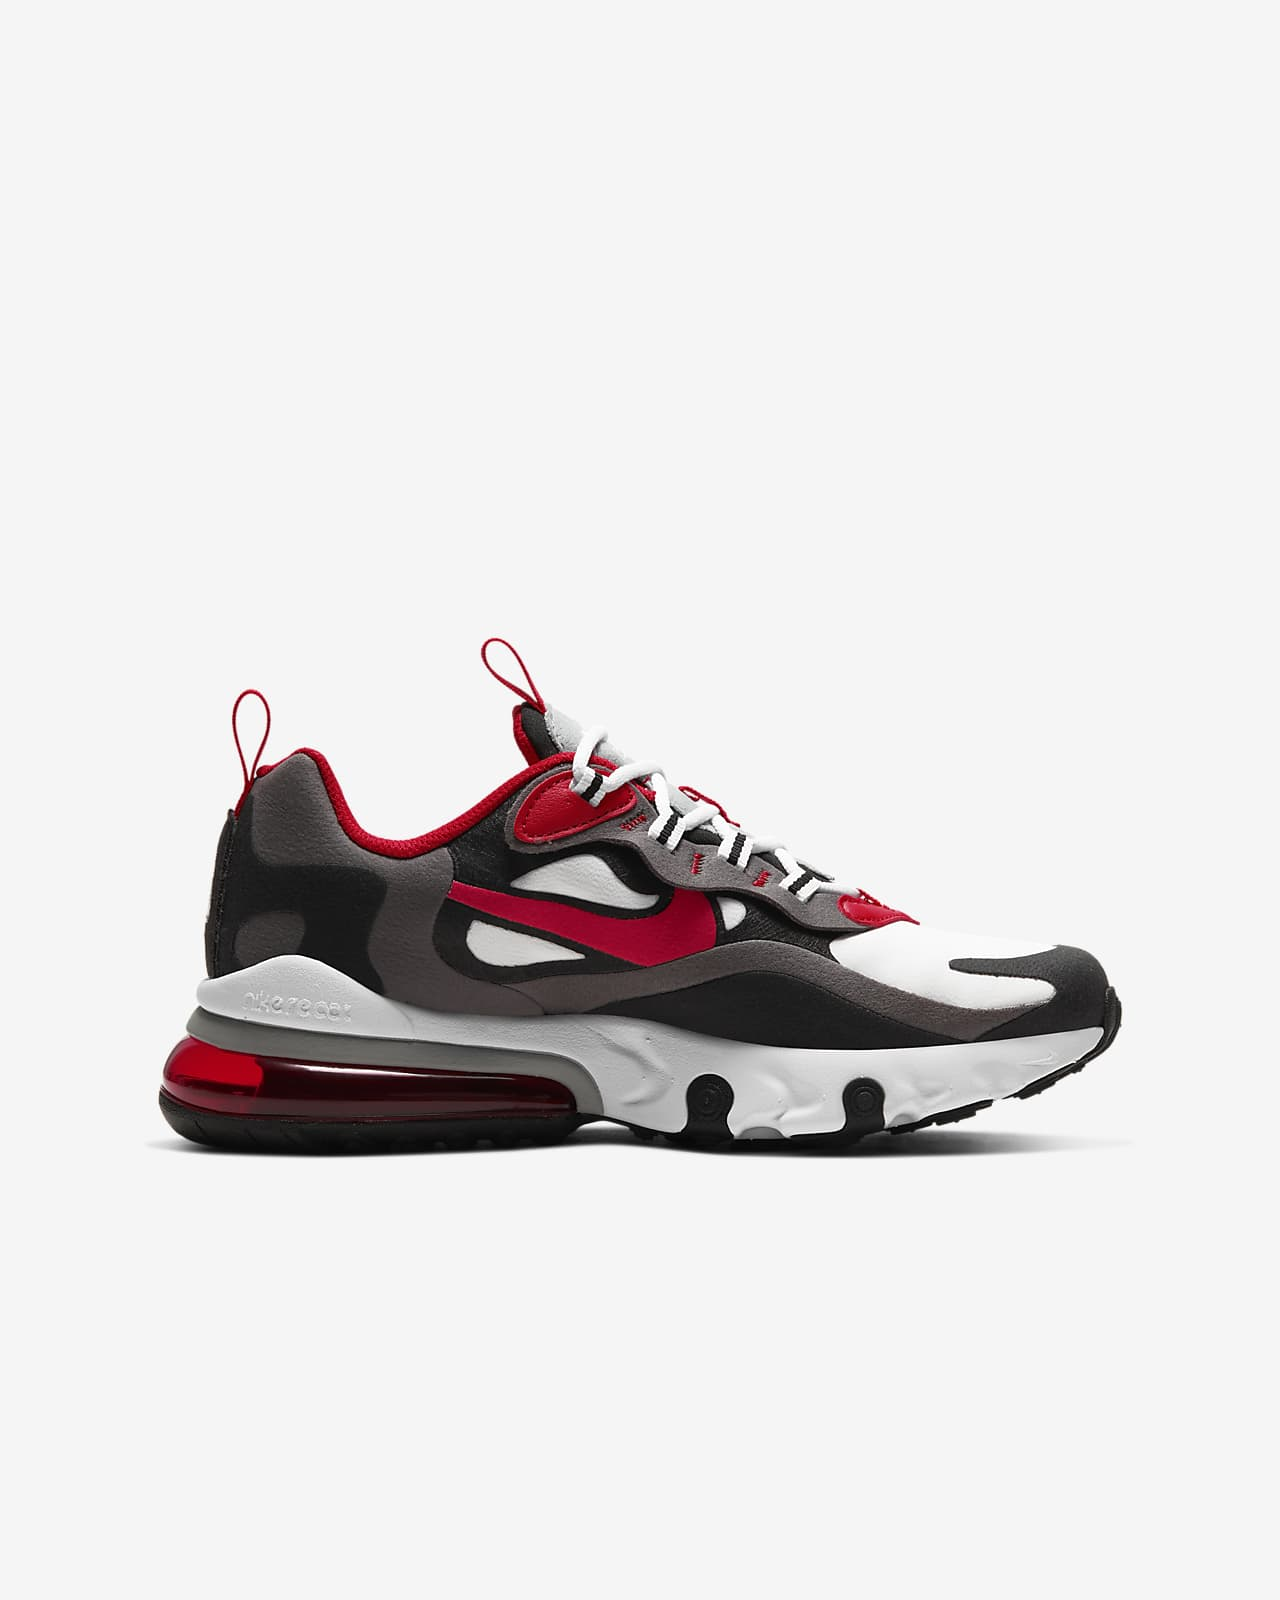 nike air max 270 negro y rojo